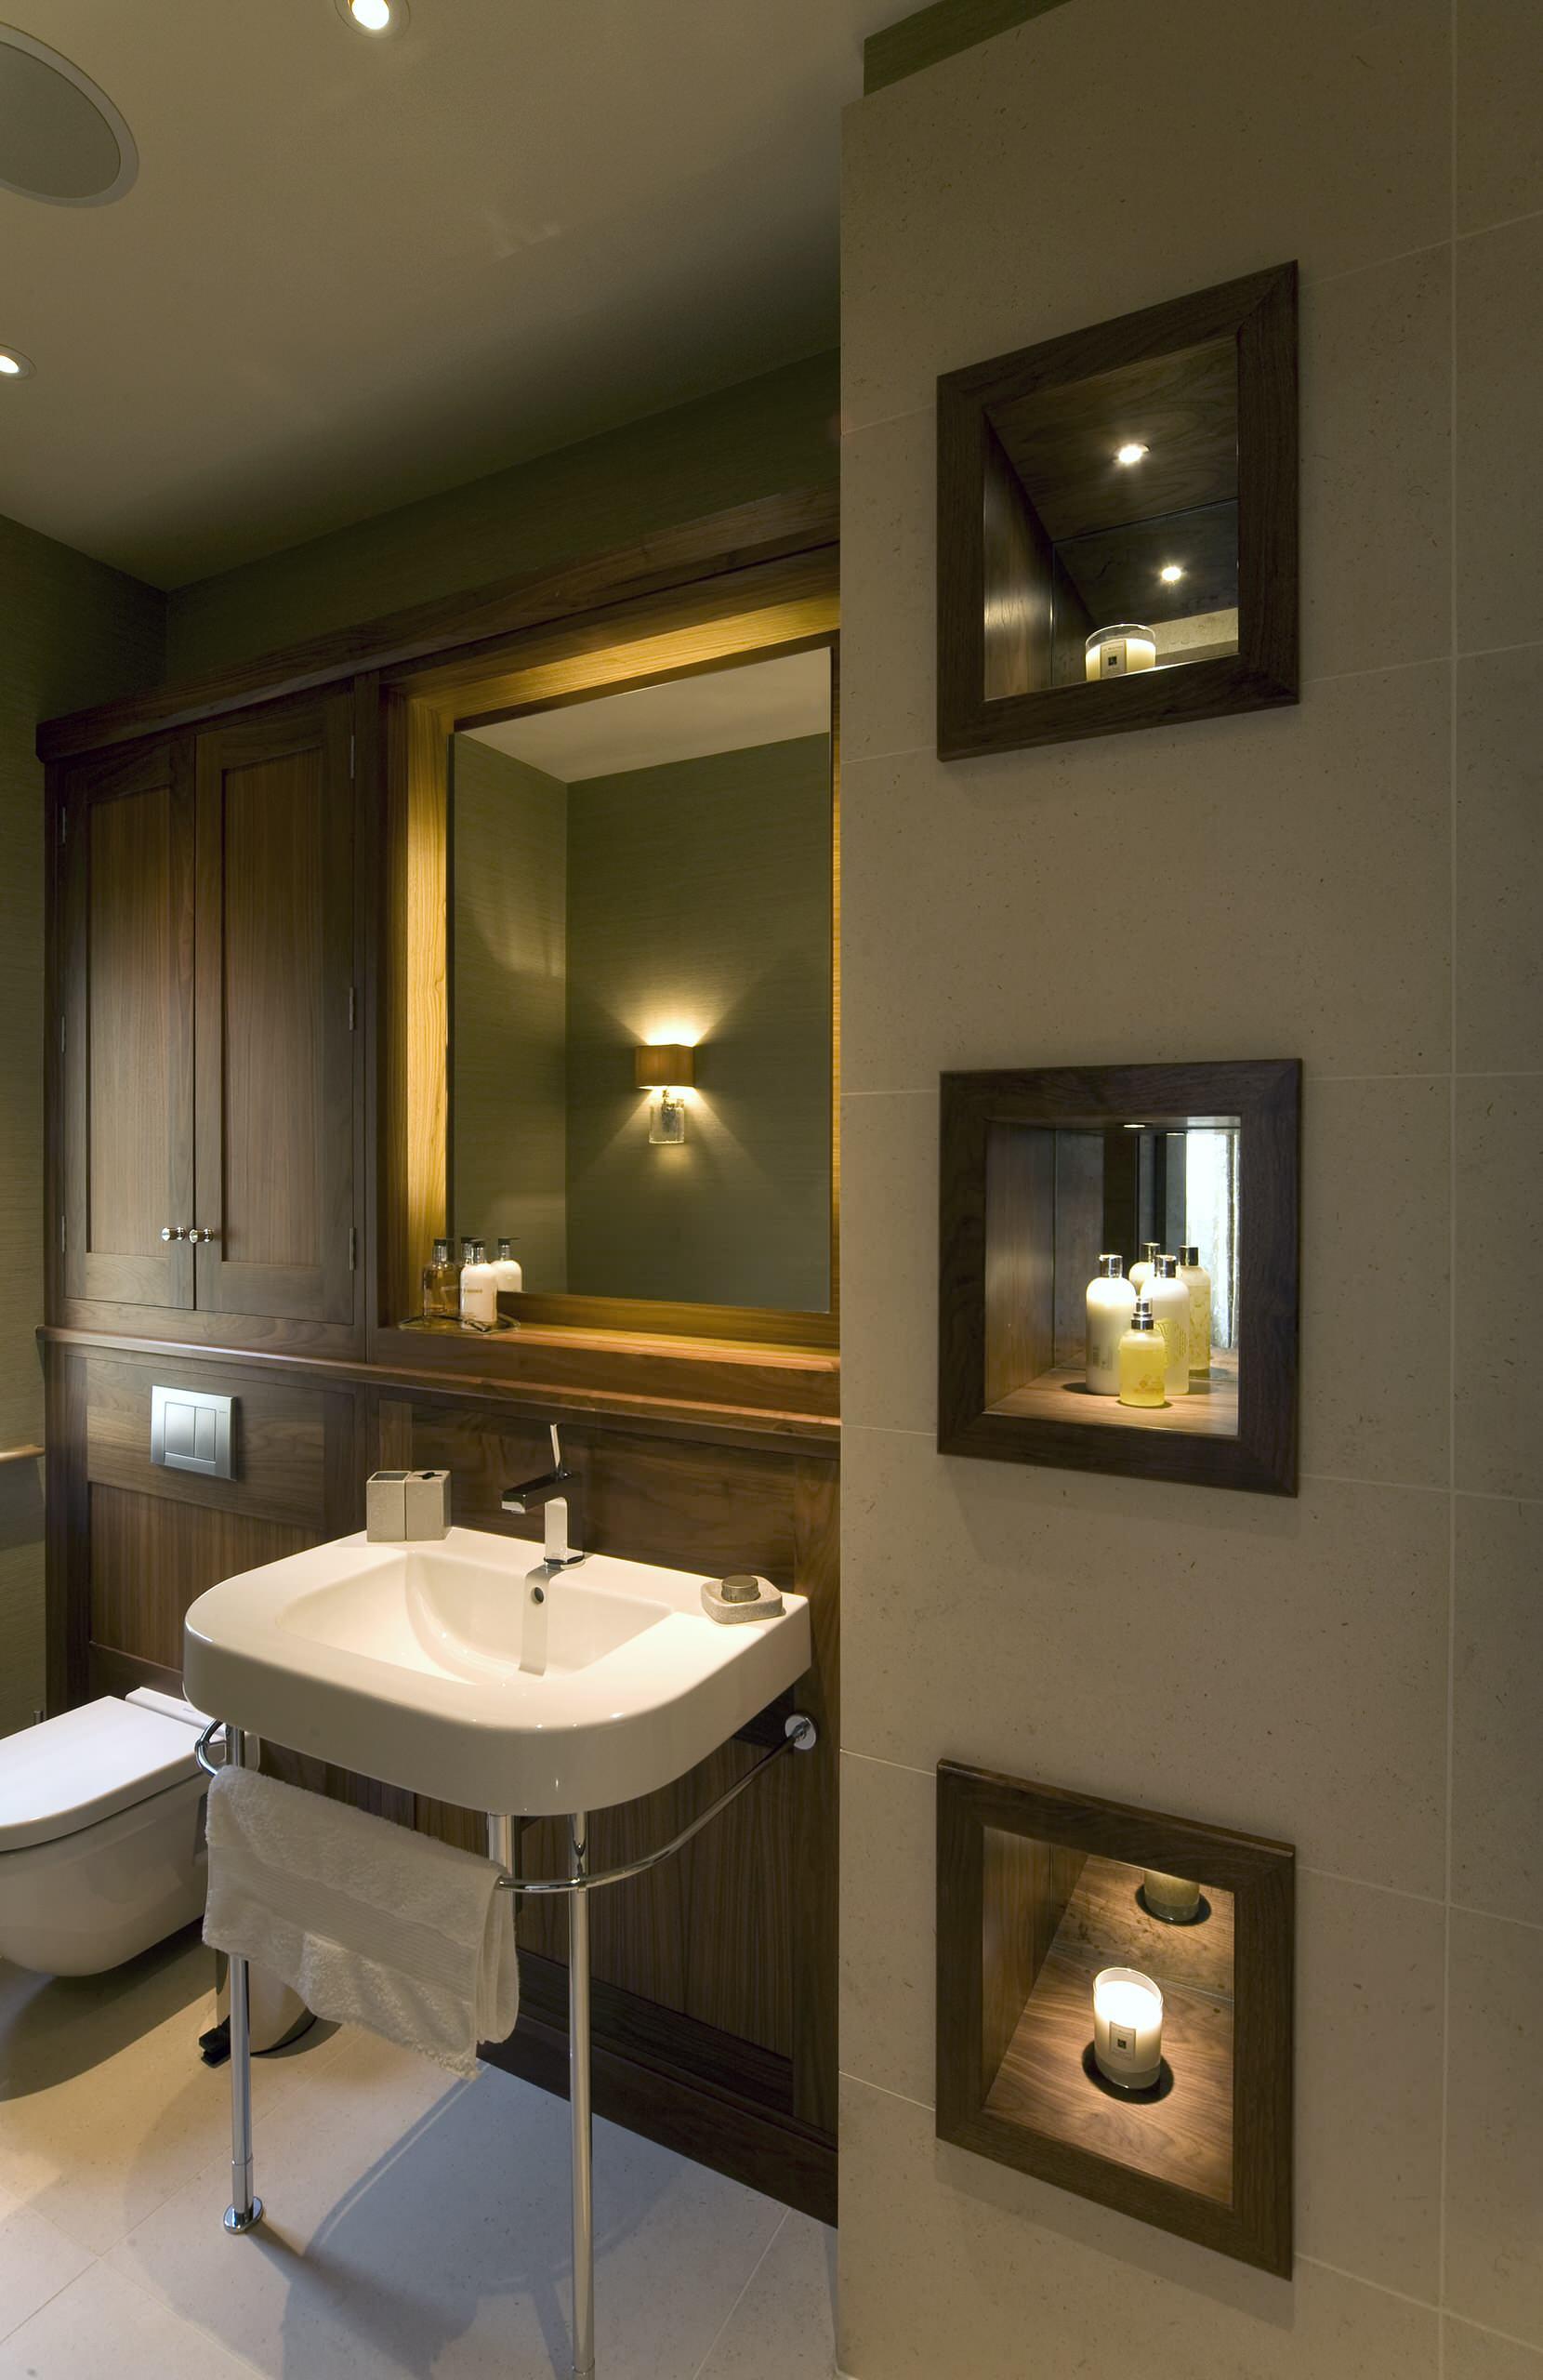 Recessed Lights For Bathroom Houzz